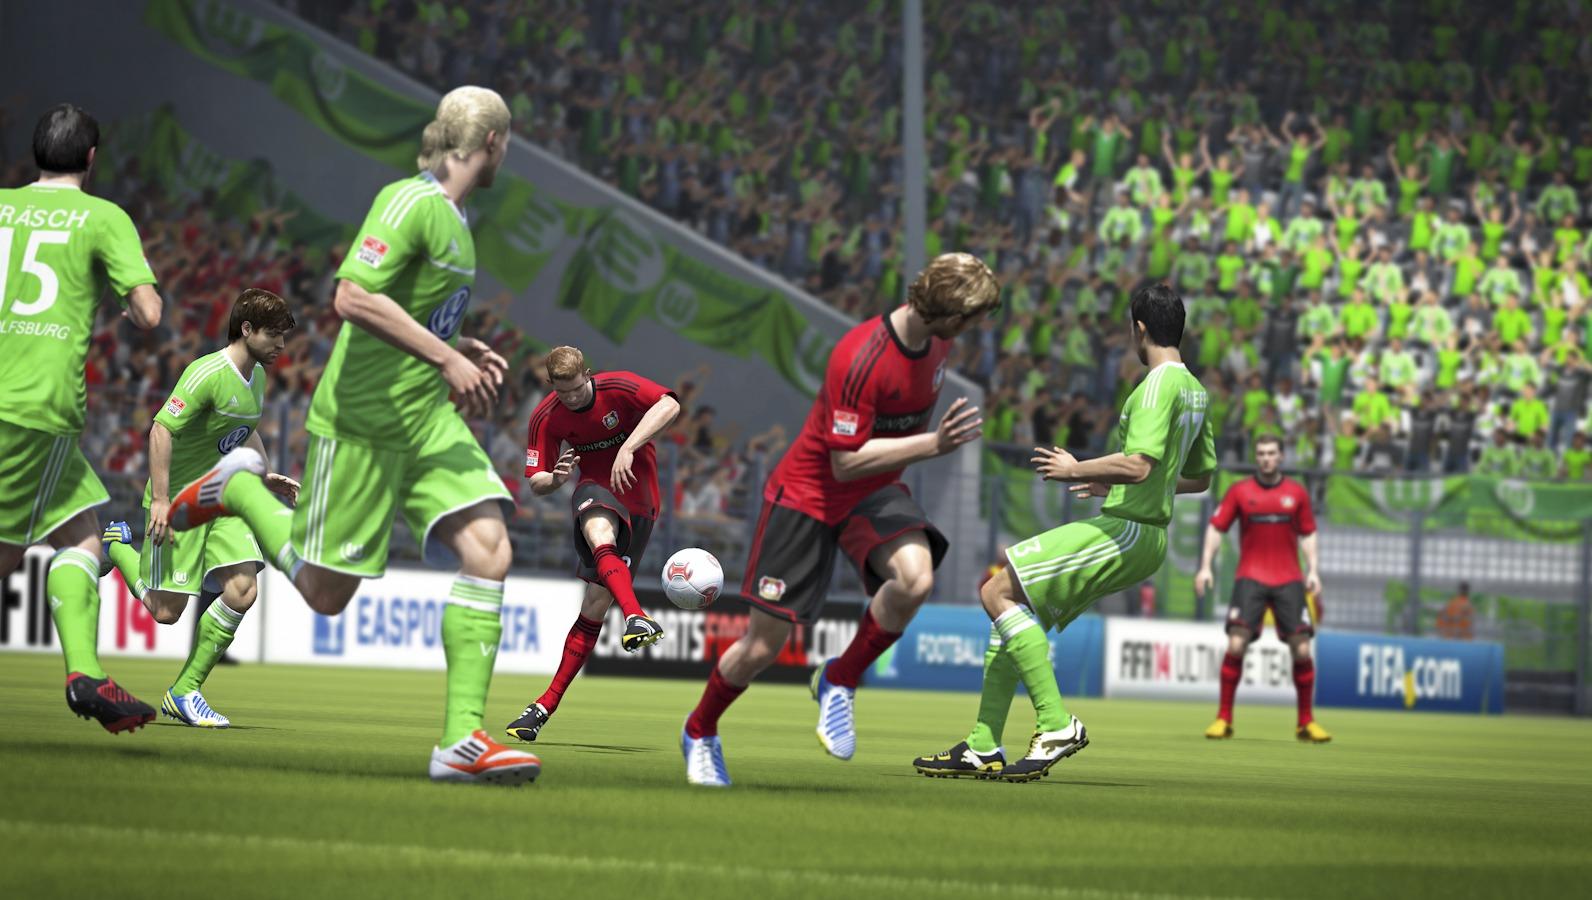 FIFA14_PS3_GE_PrecisionMovement2.JPG